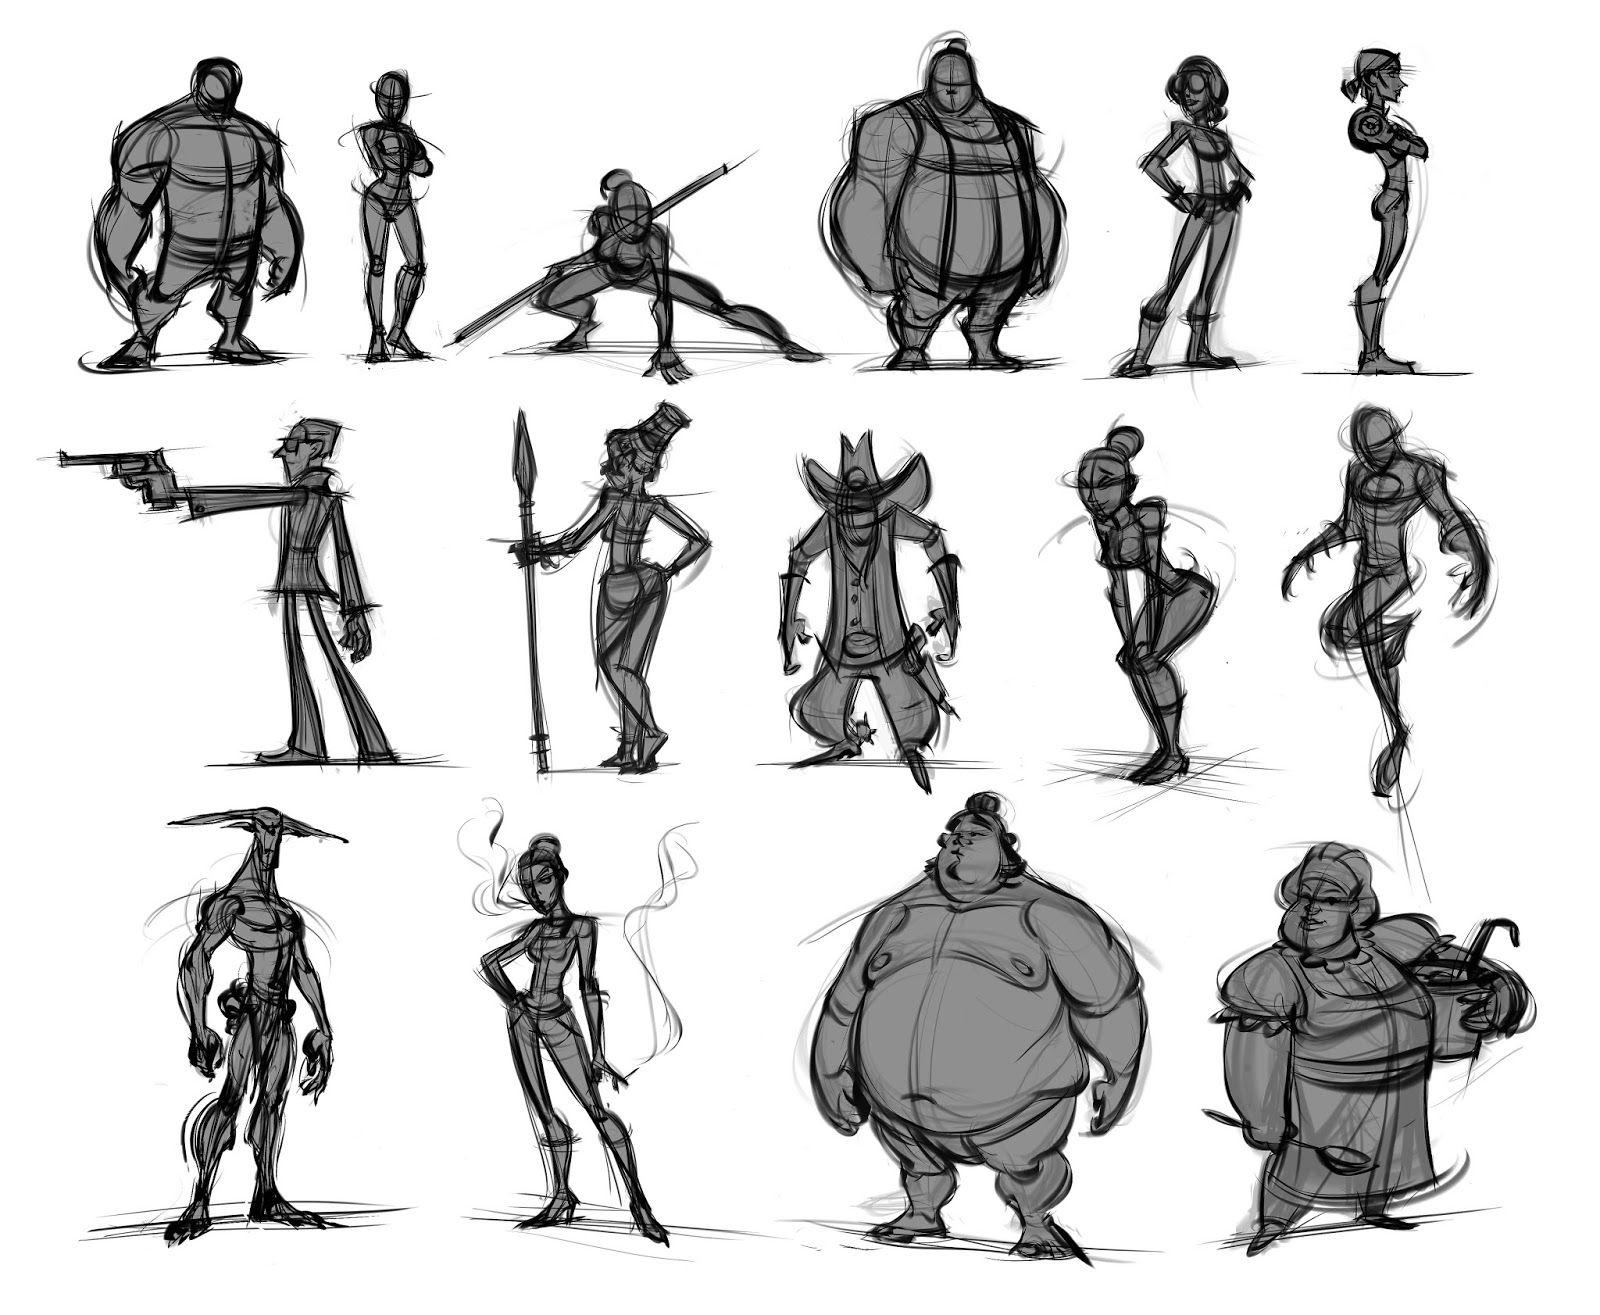 Stephen Silver Character Design App : Artstation fundamentals of character design with stephen silver